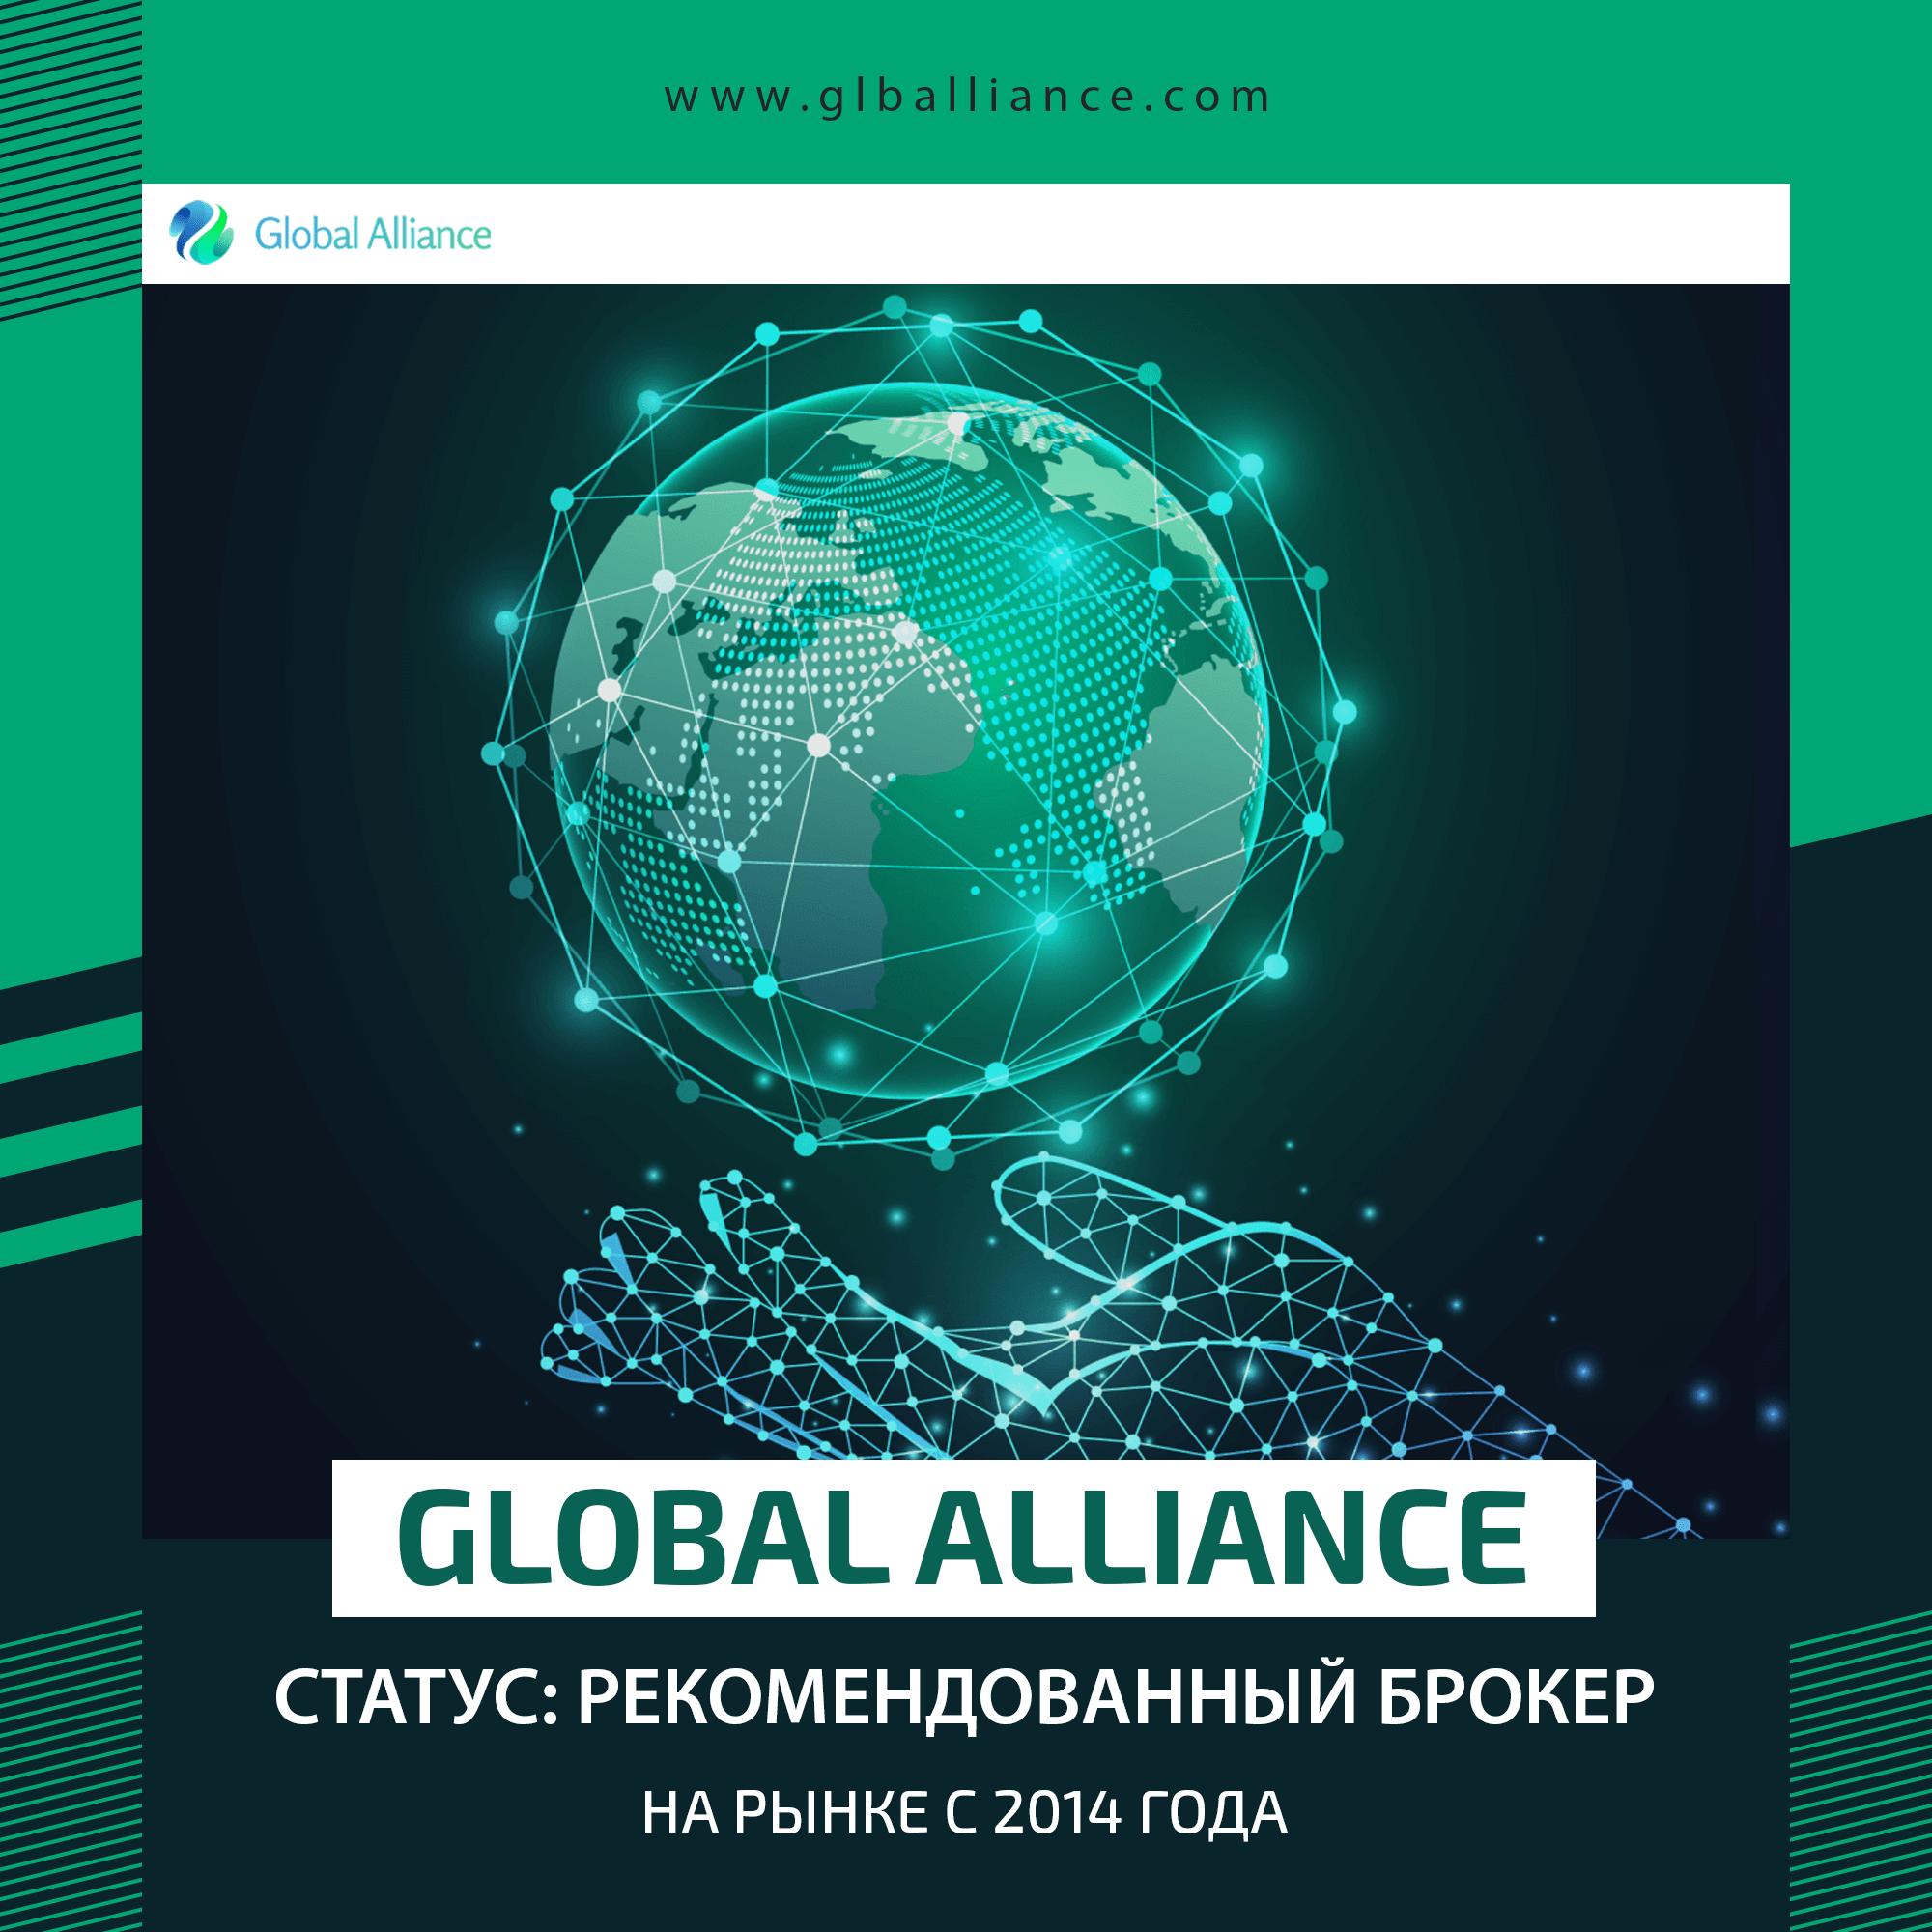 Global Alliance (glballiance.com) - отзывы. Развод или работает